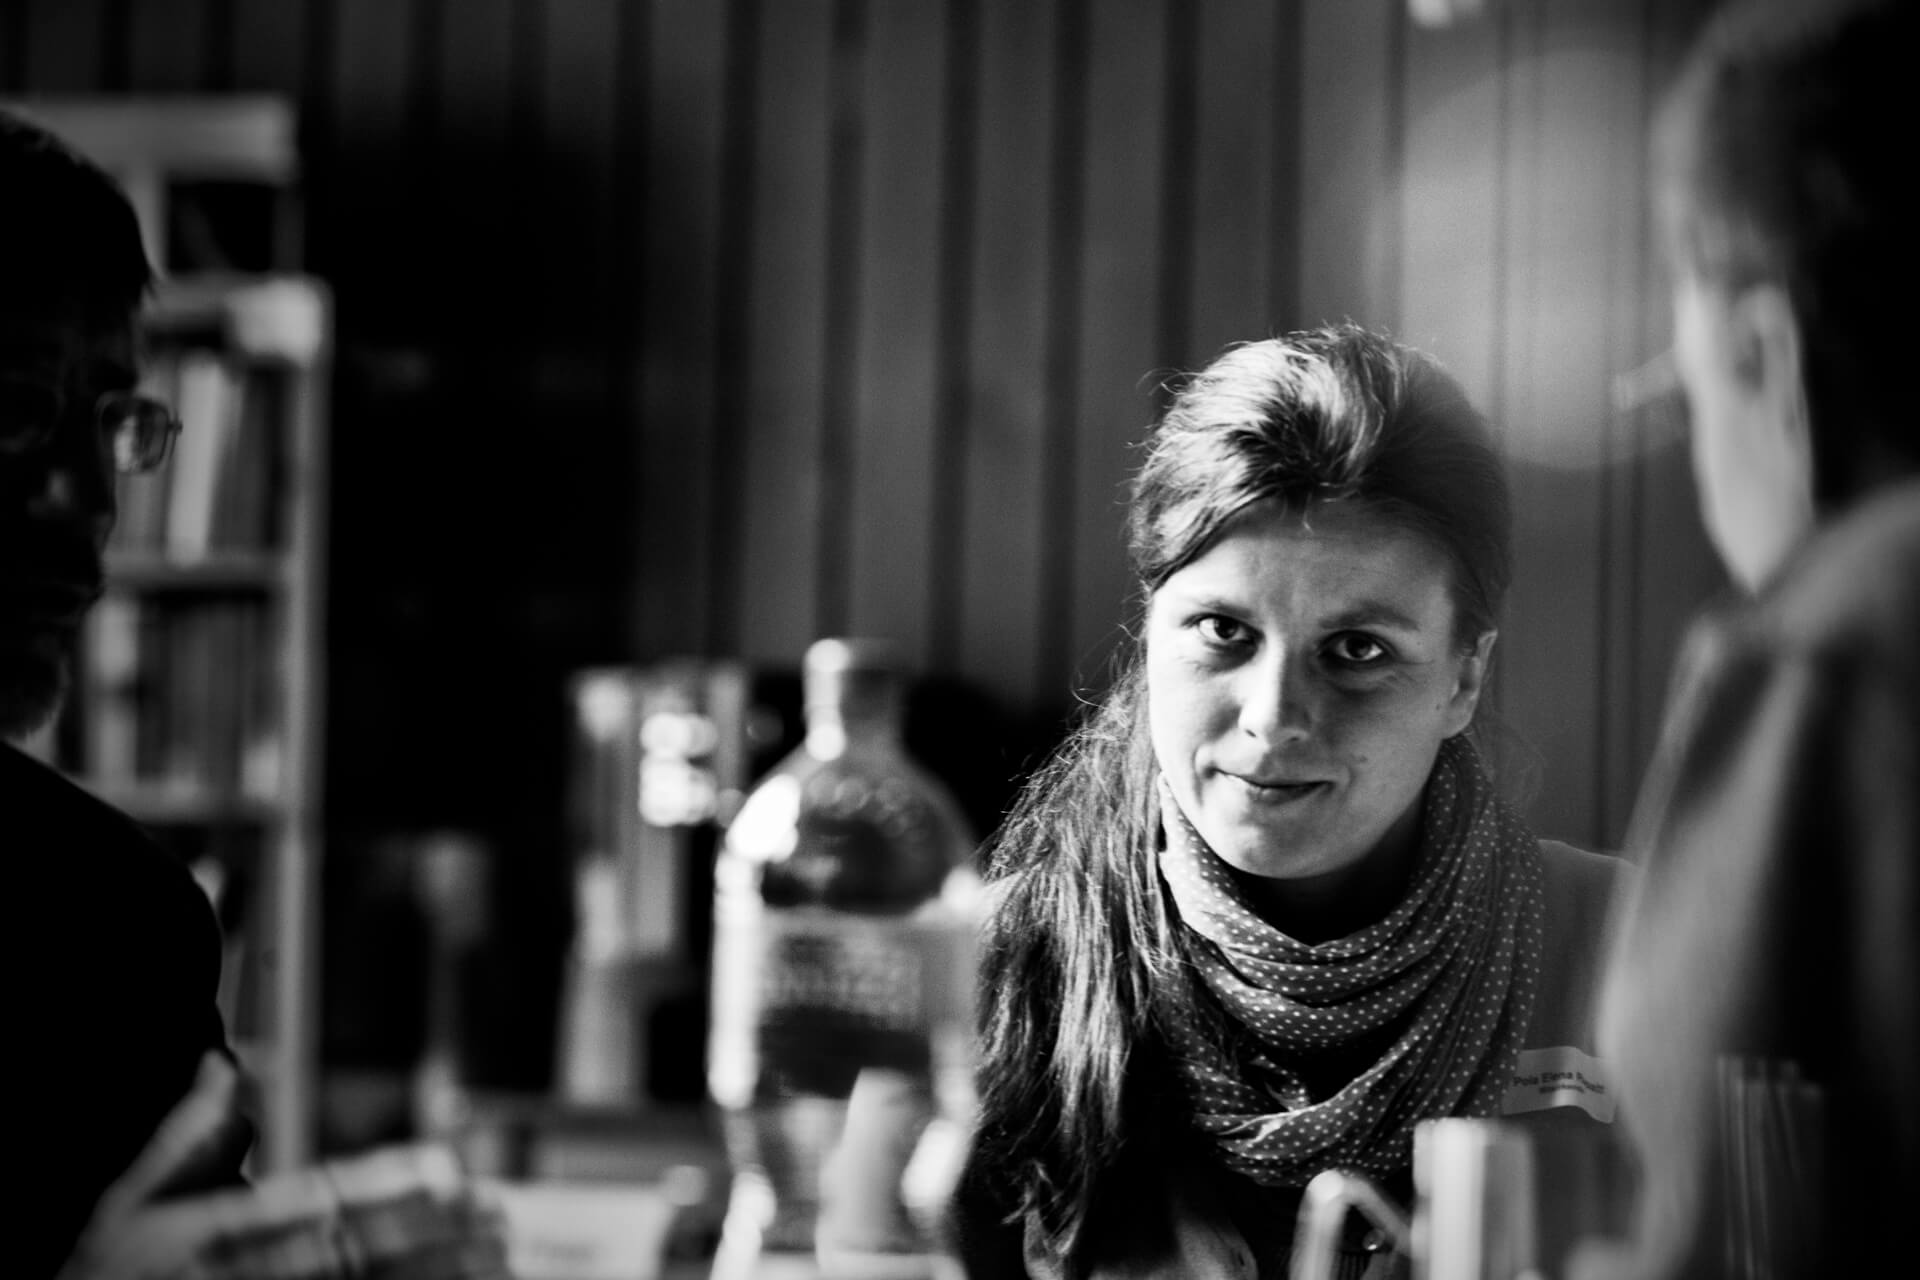 Portraitfoto - Fotostudio Detmold tomfluegge